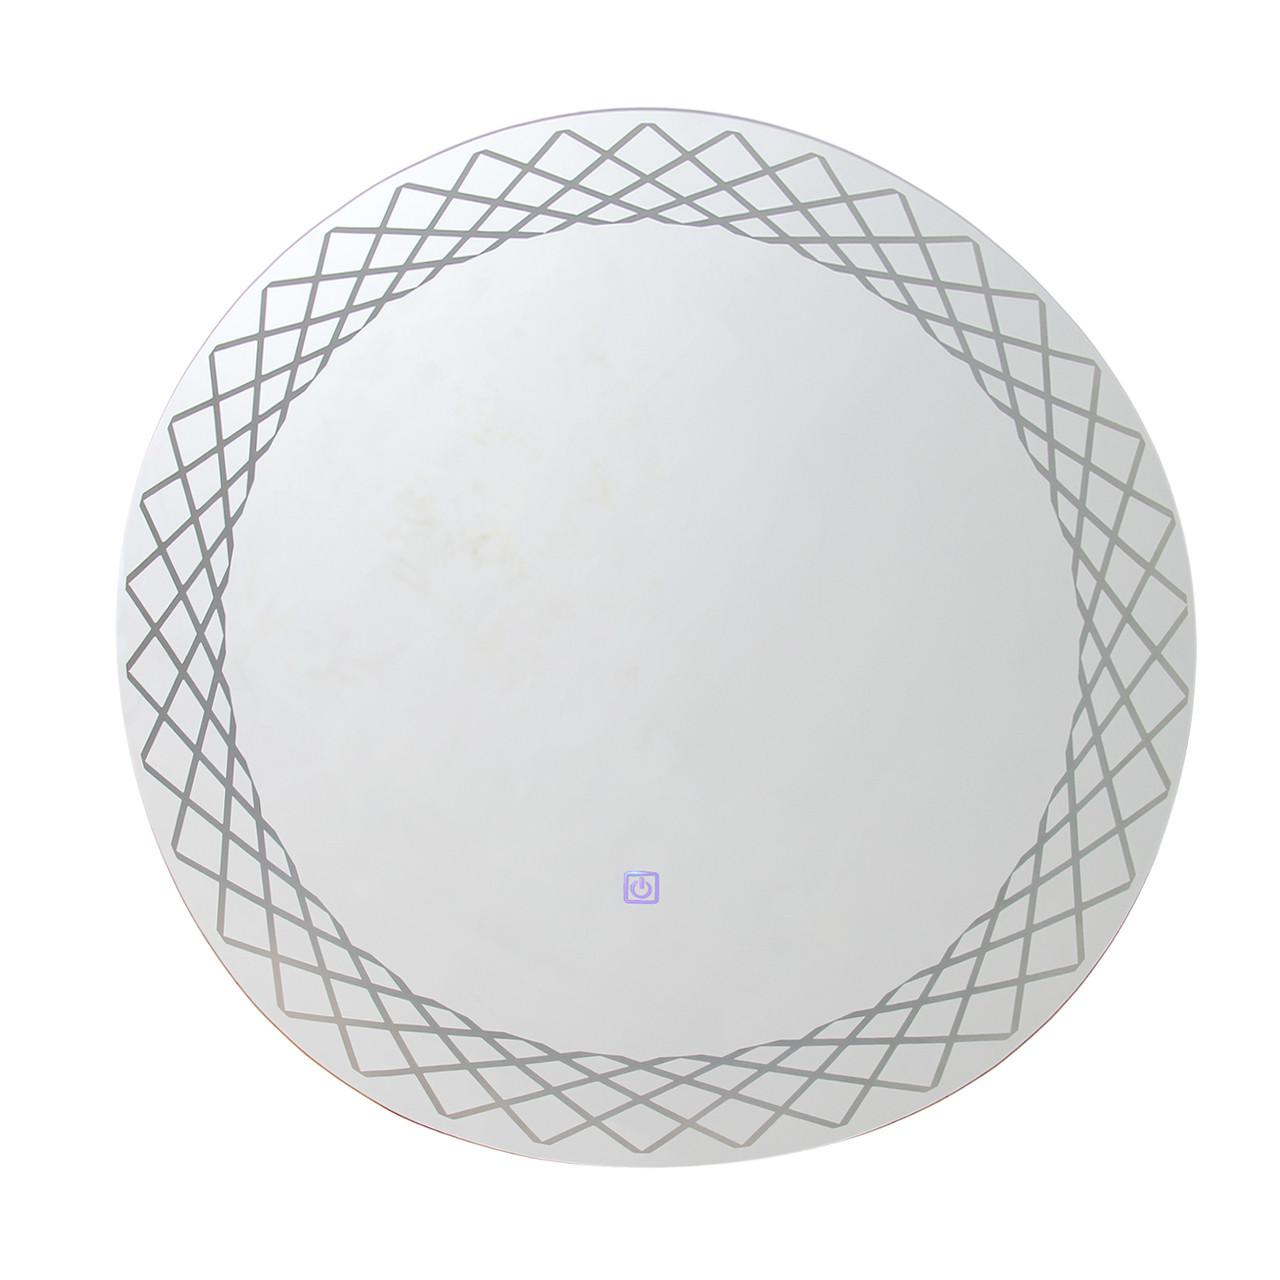 LED032 Зеркало для ванной круглое 70x70 с подсветкой